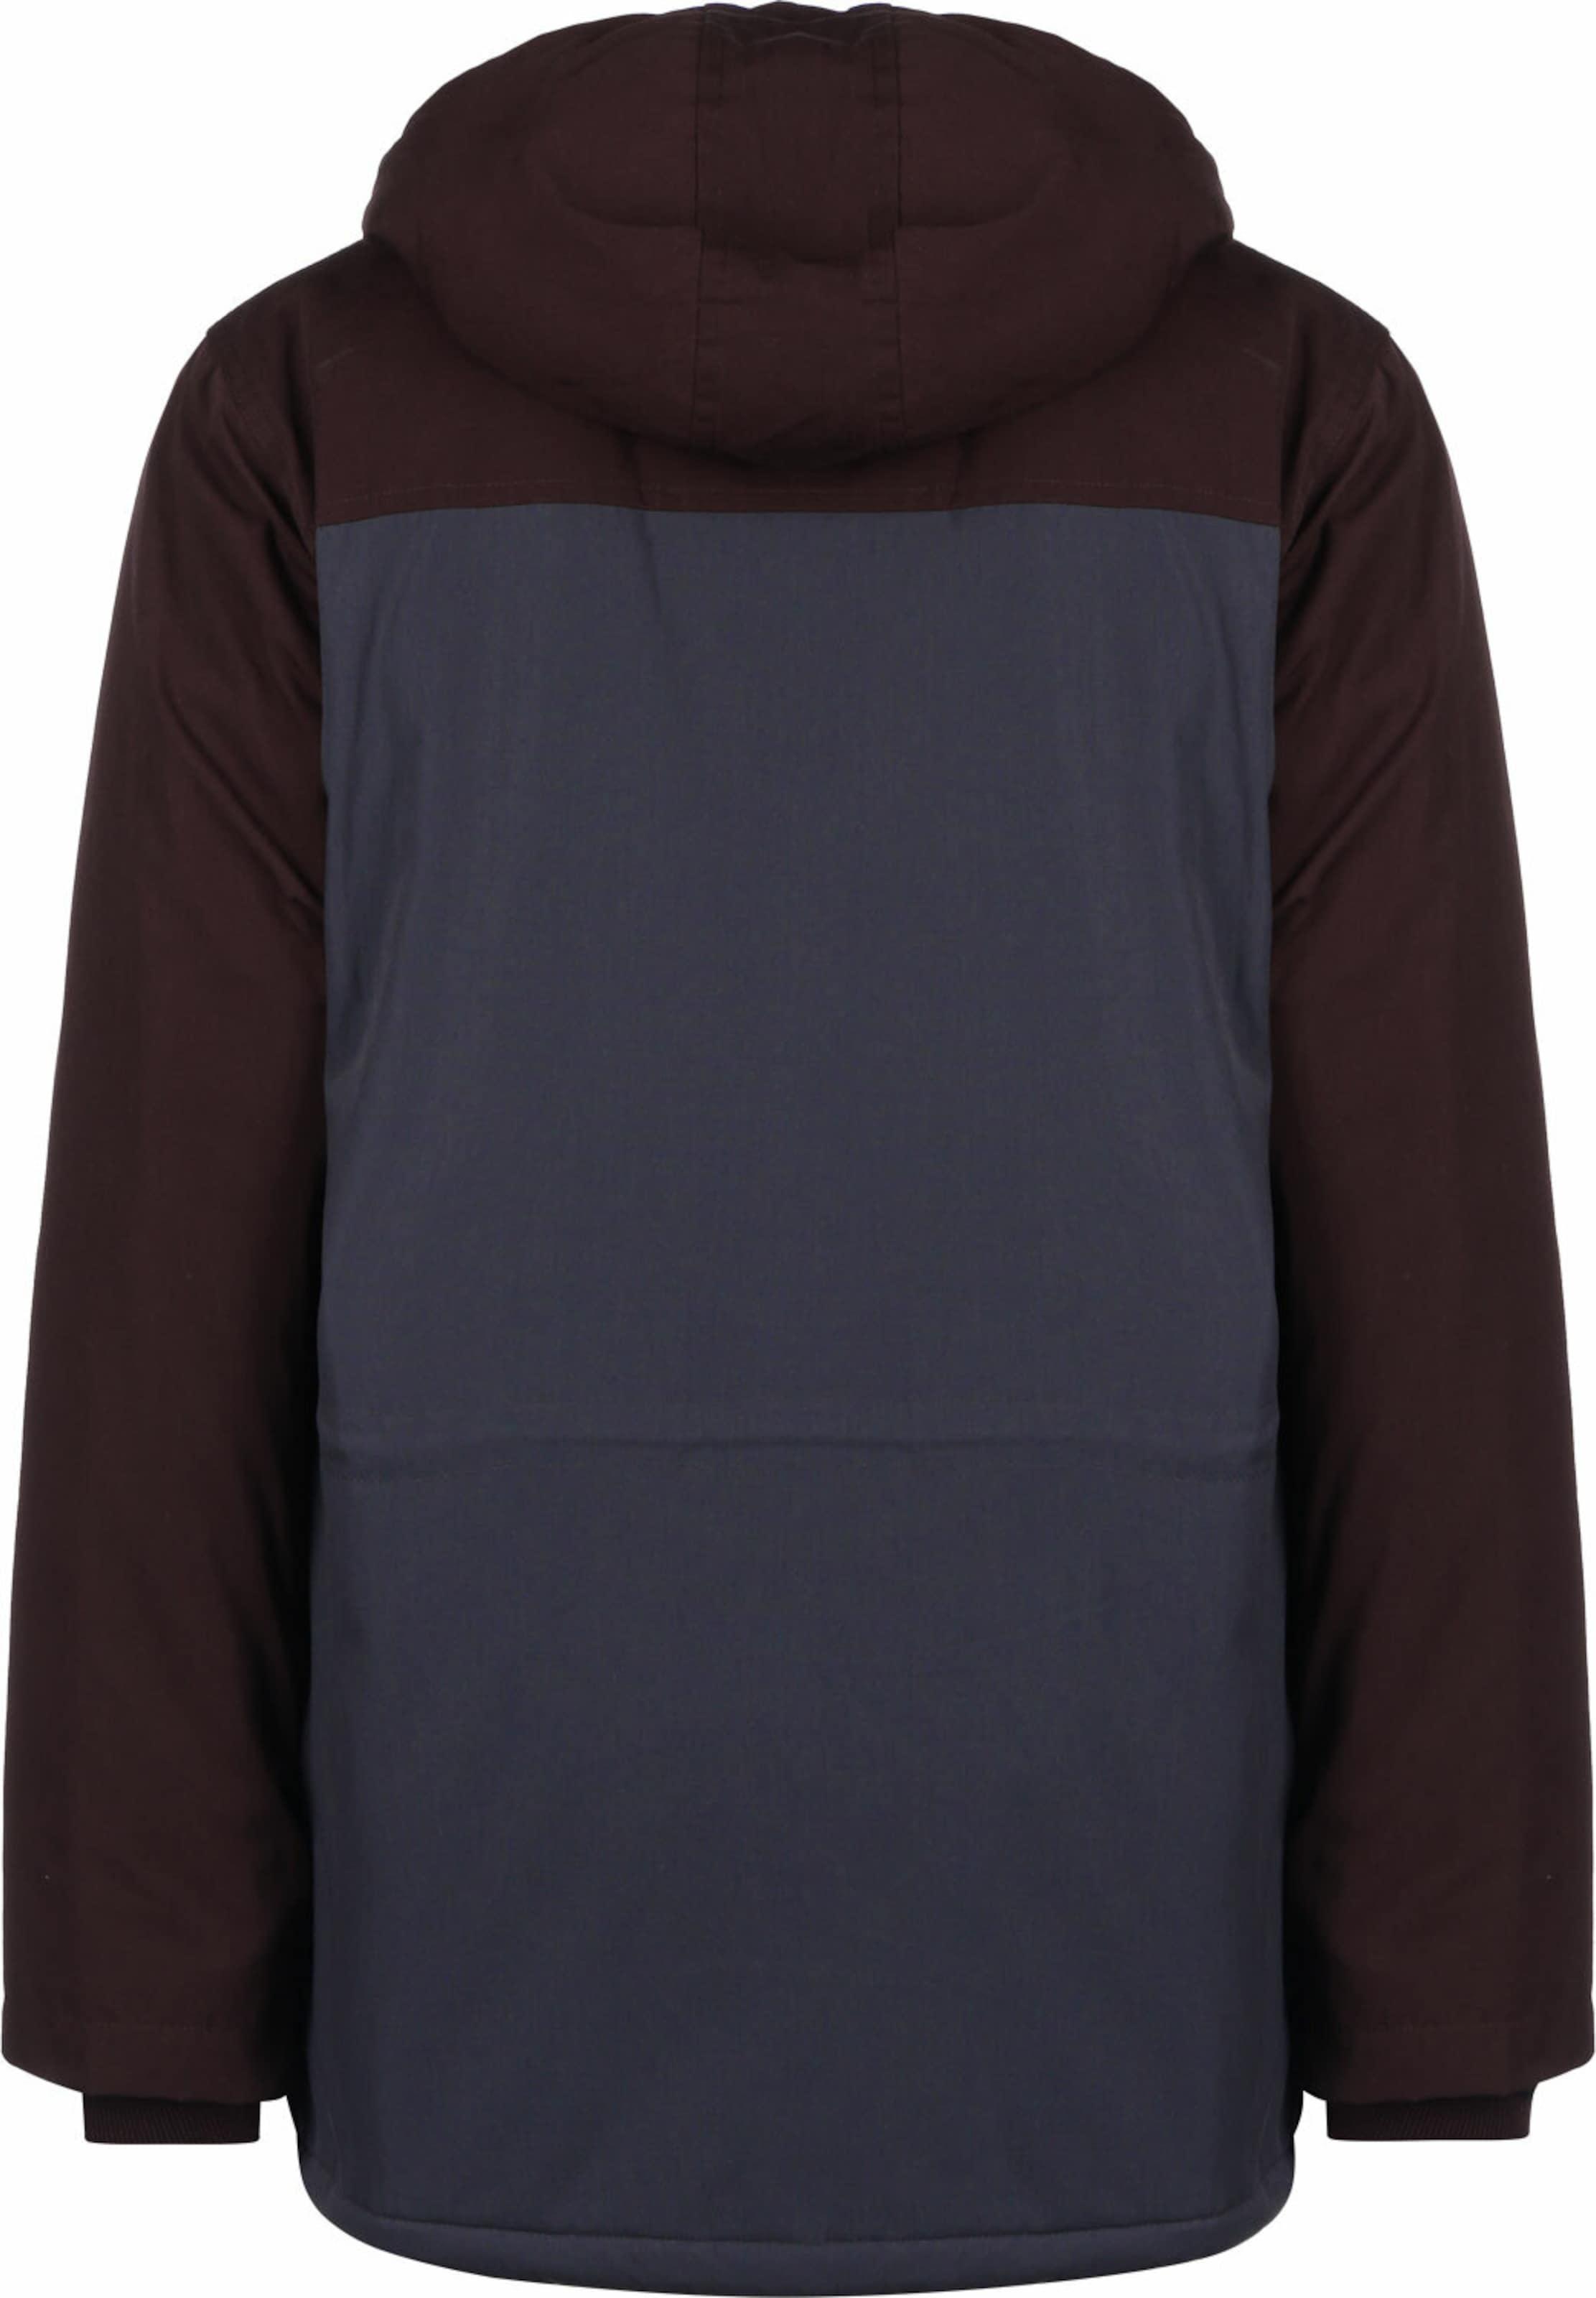 Iriedaily Parka ' Eissegler 2.0 ' in lila / rot / schwarz Color-Blocking KJ23145041